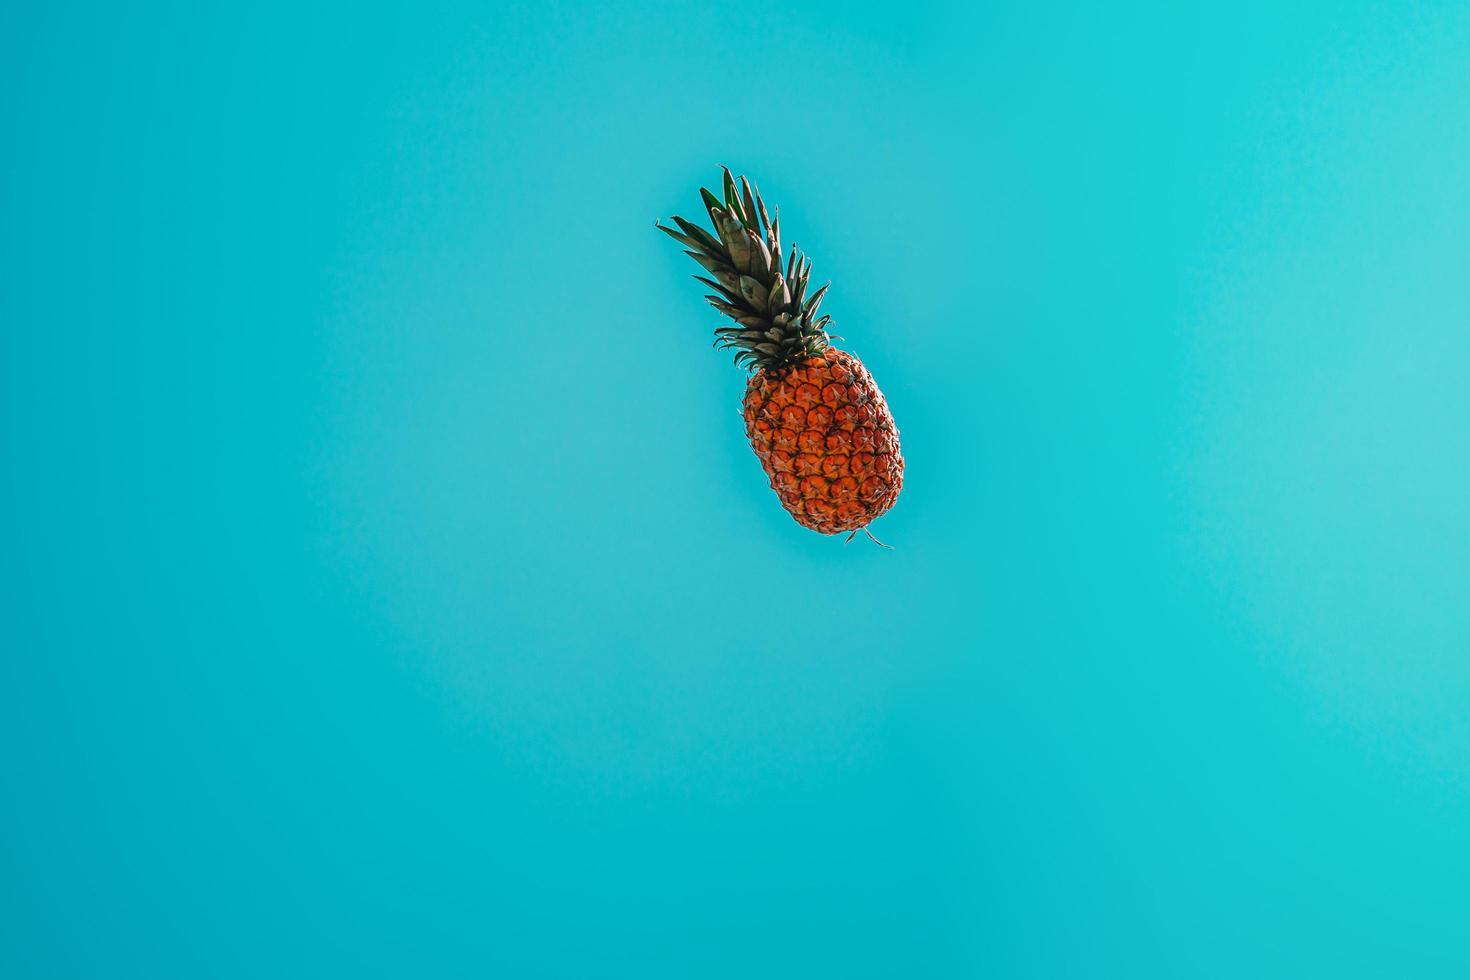 Ananas fliegt in den Himmel foto